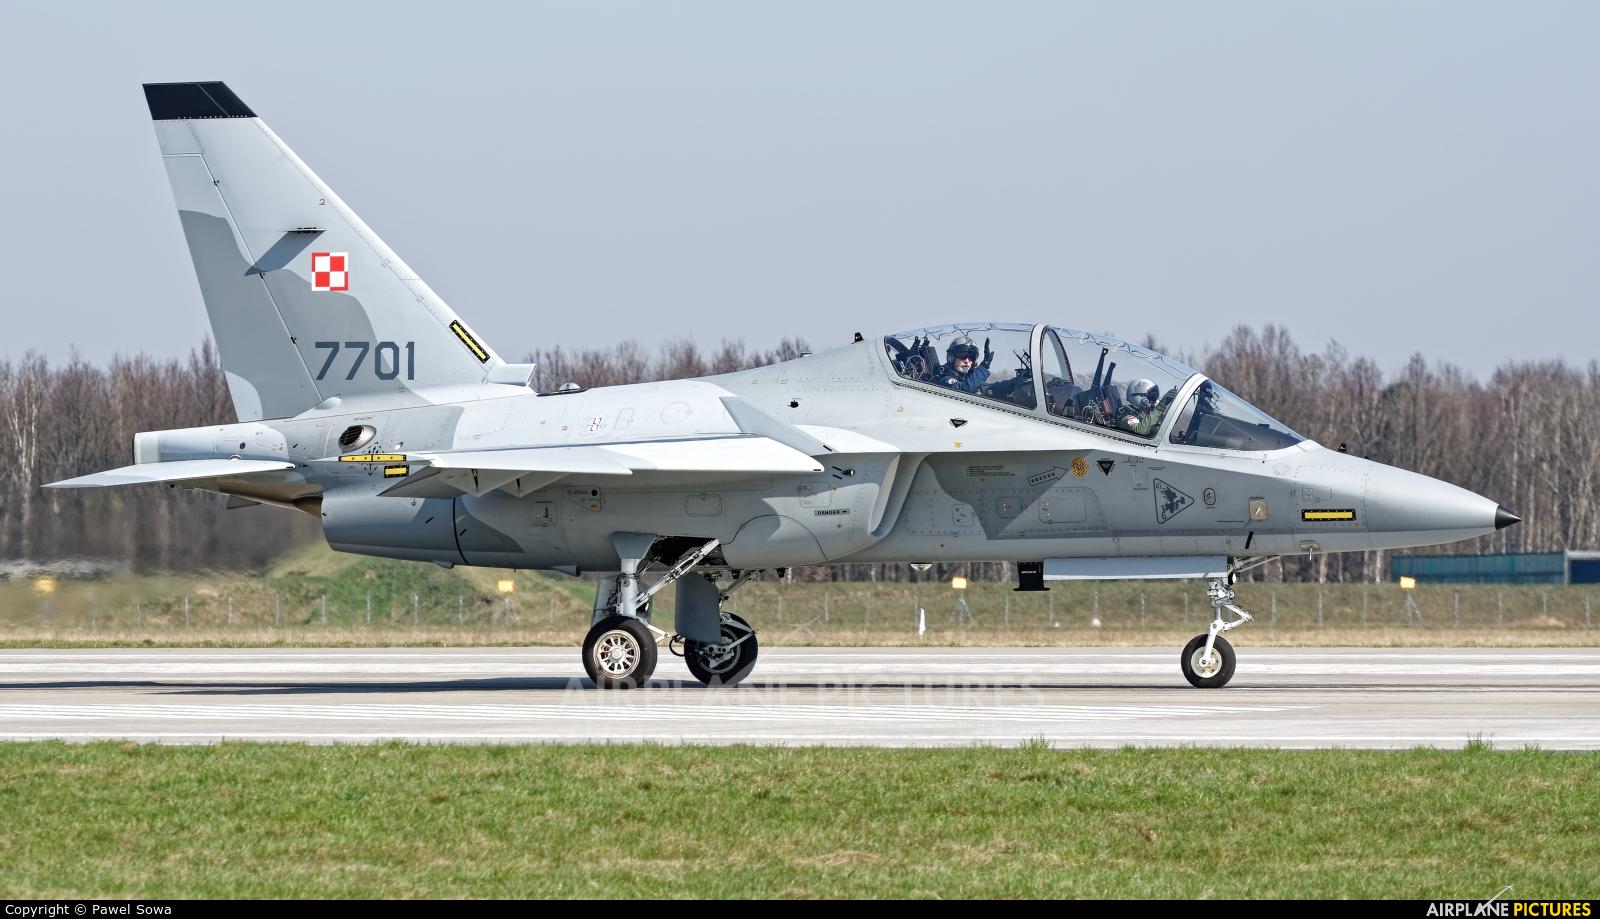 Poland - Air Force 7701 aircraft at Dęblin